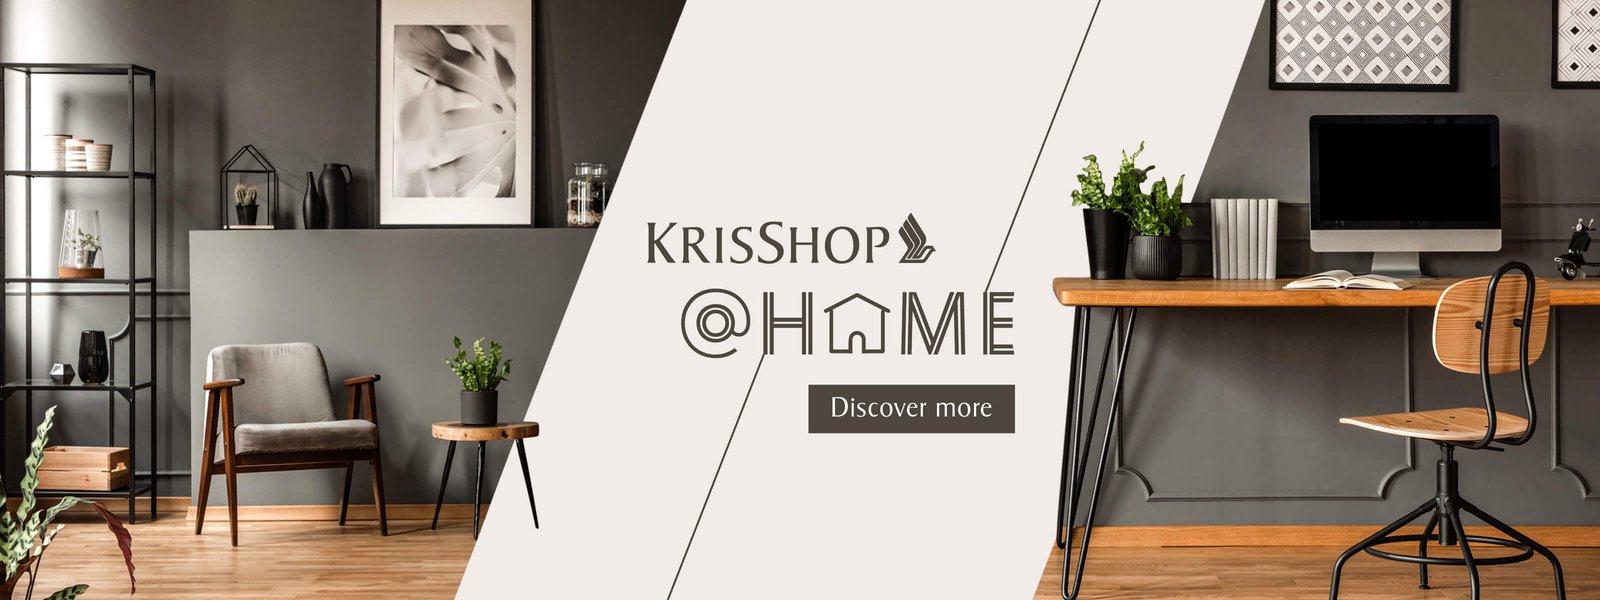 KrisShop @ Home